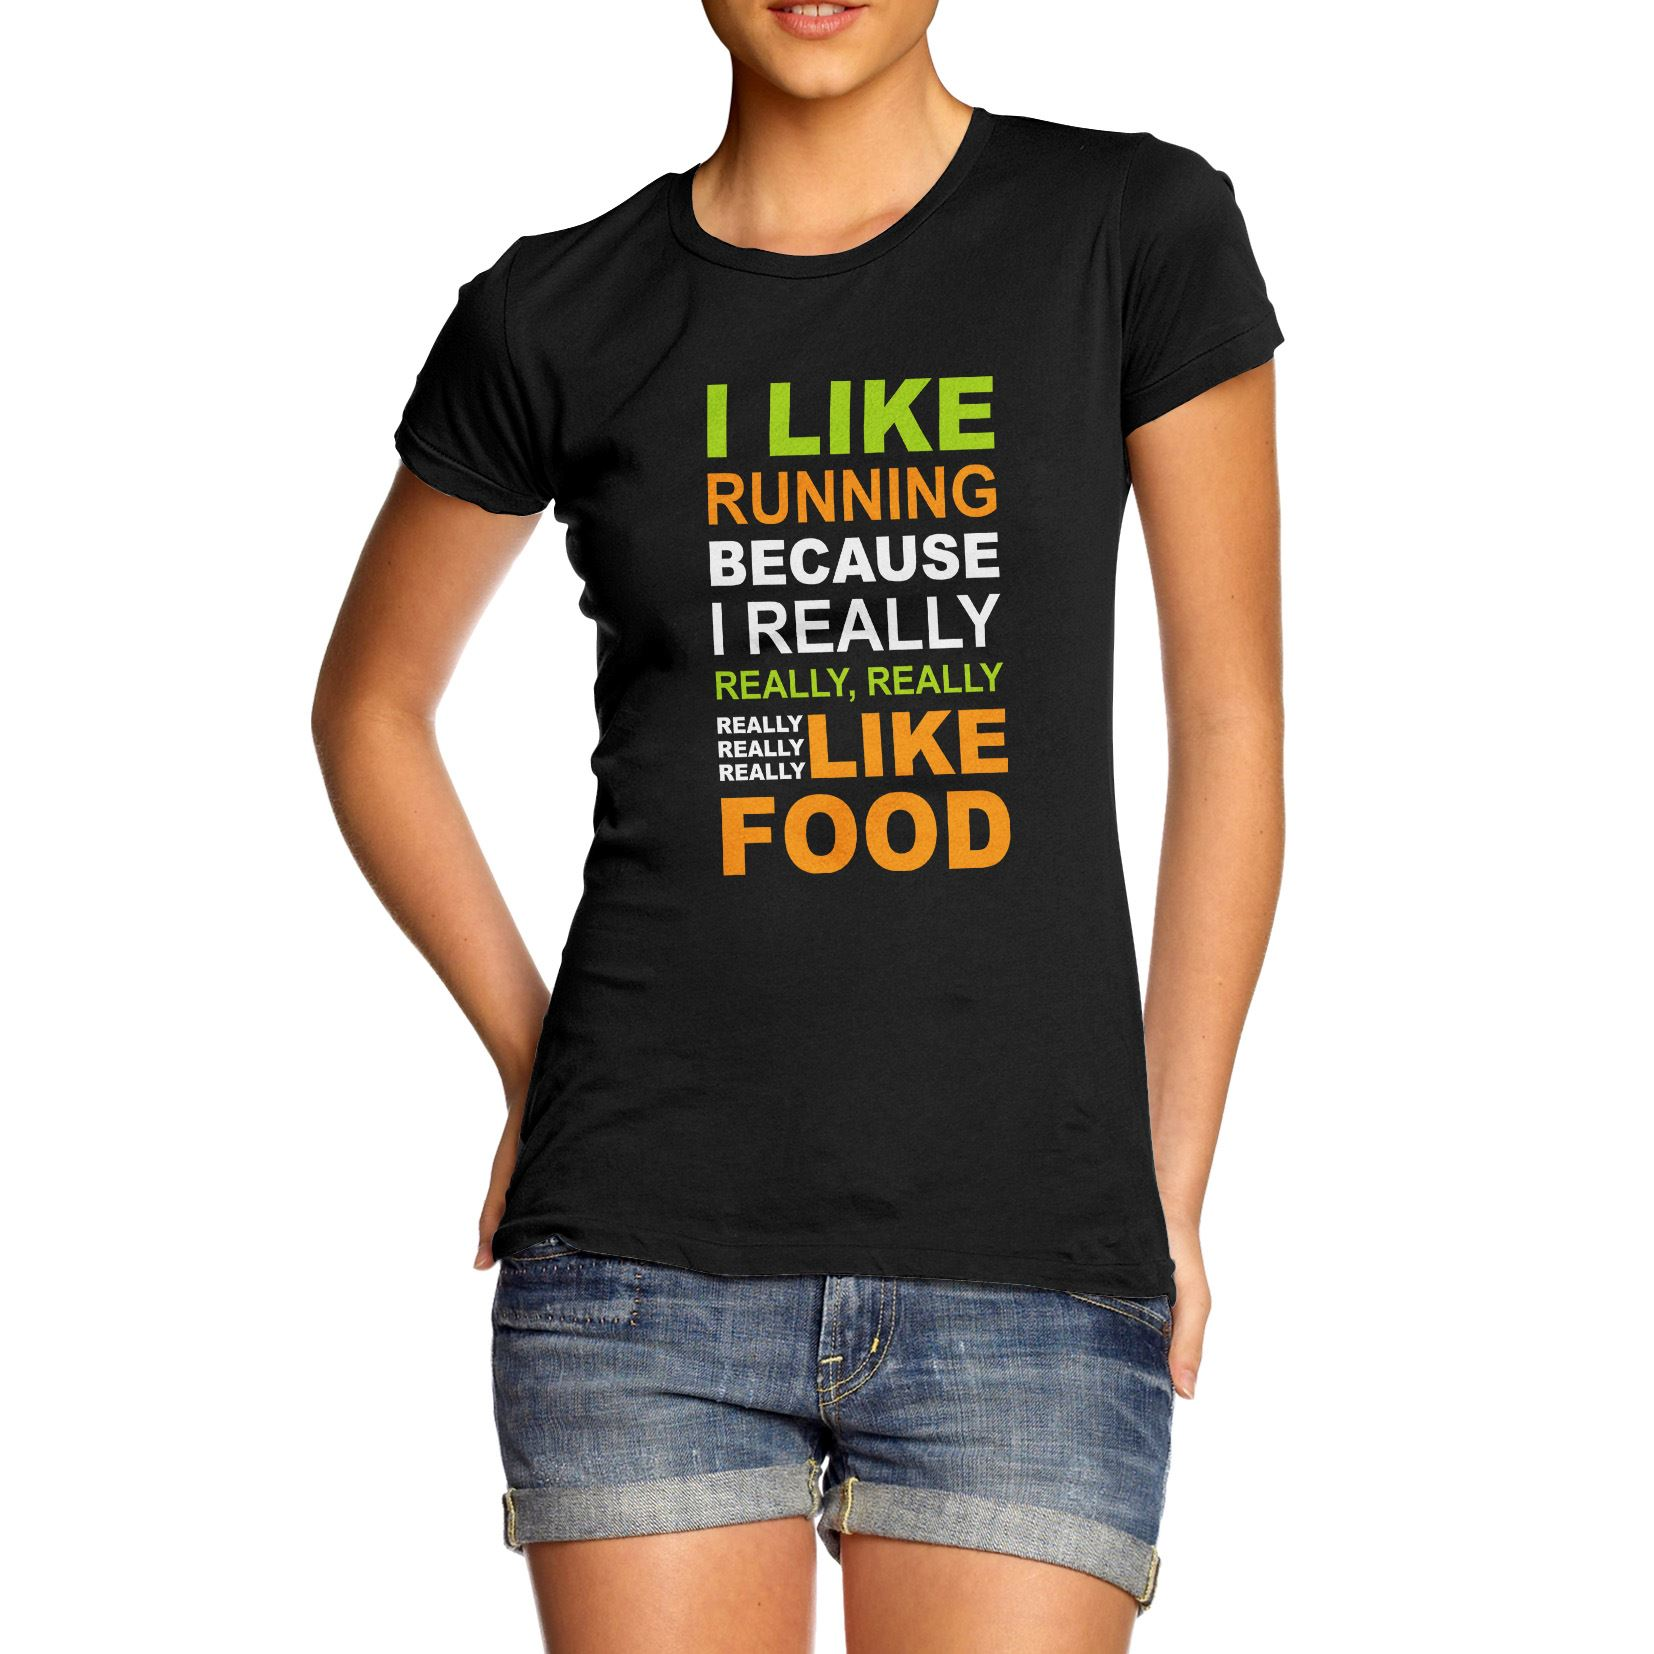 Twisted-Envy-Women-039-s-I-Like-Running-Because-I-Like-Food-Funny-T-Shirt